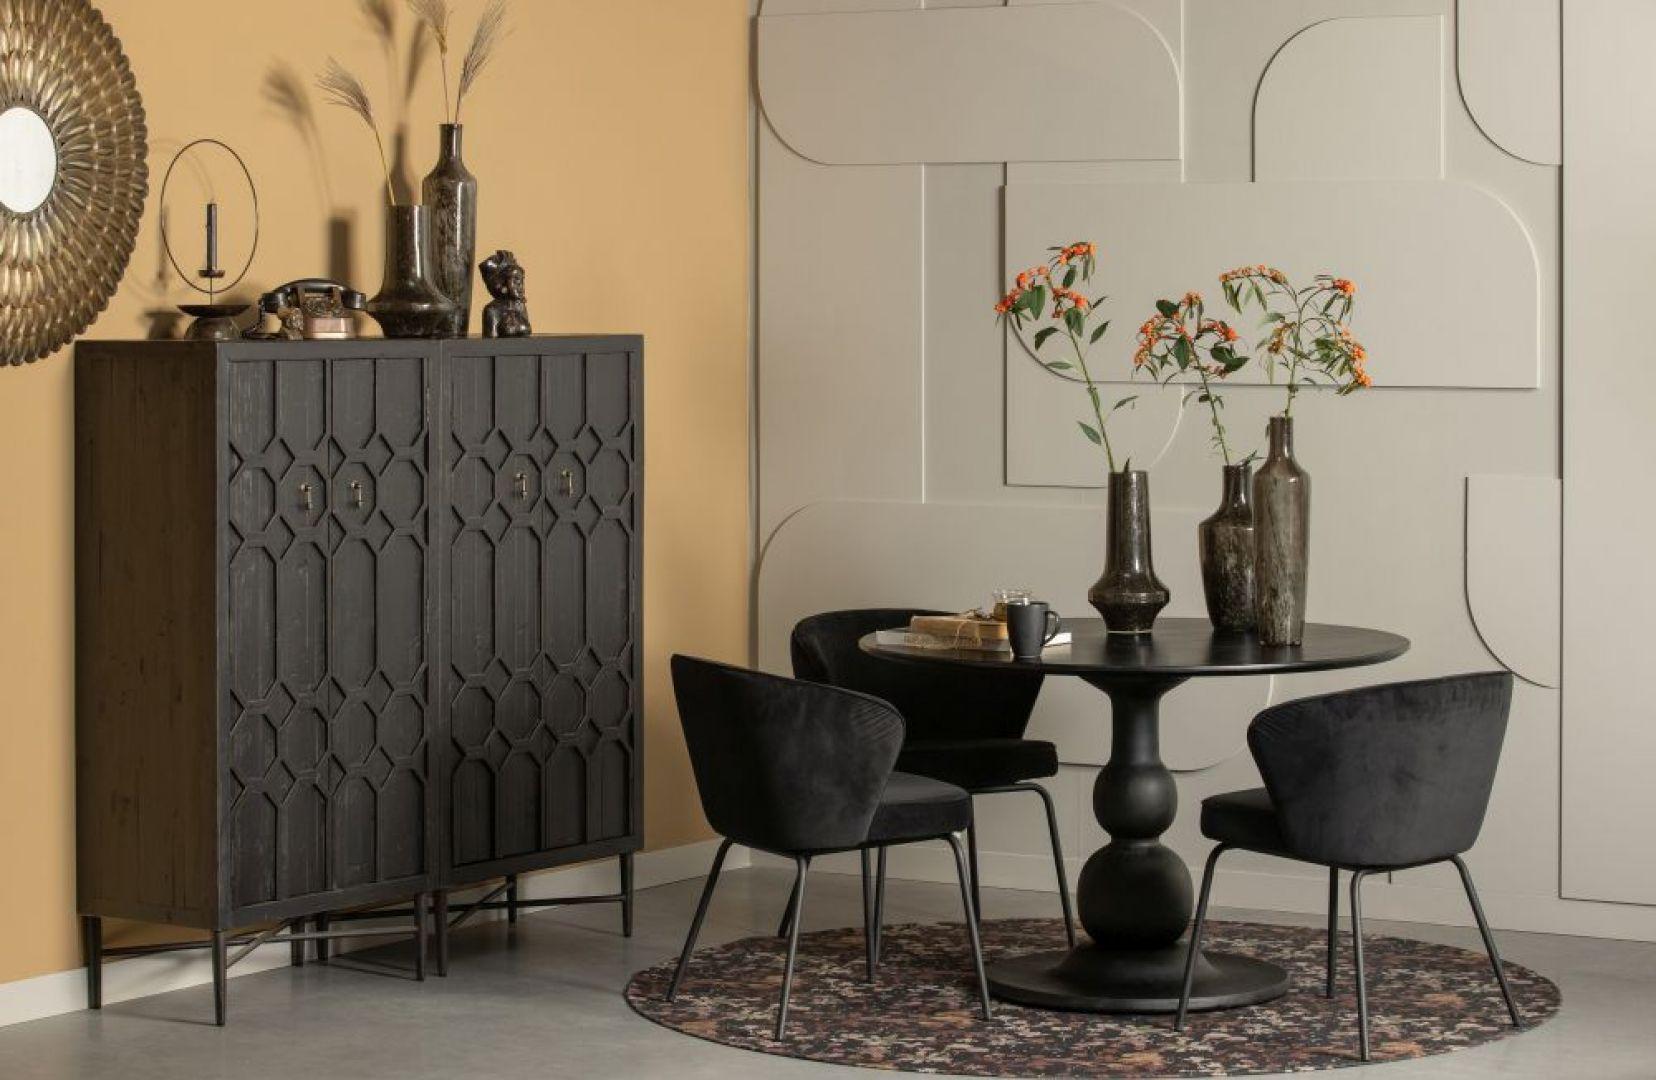 Pomysł na stylowe meble do salonu i jadalni marki Be pure/Dutchhouse.pl